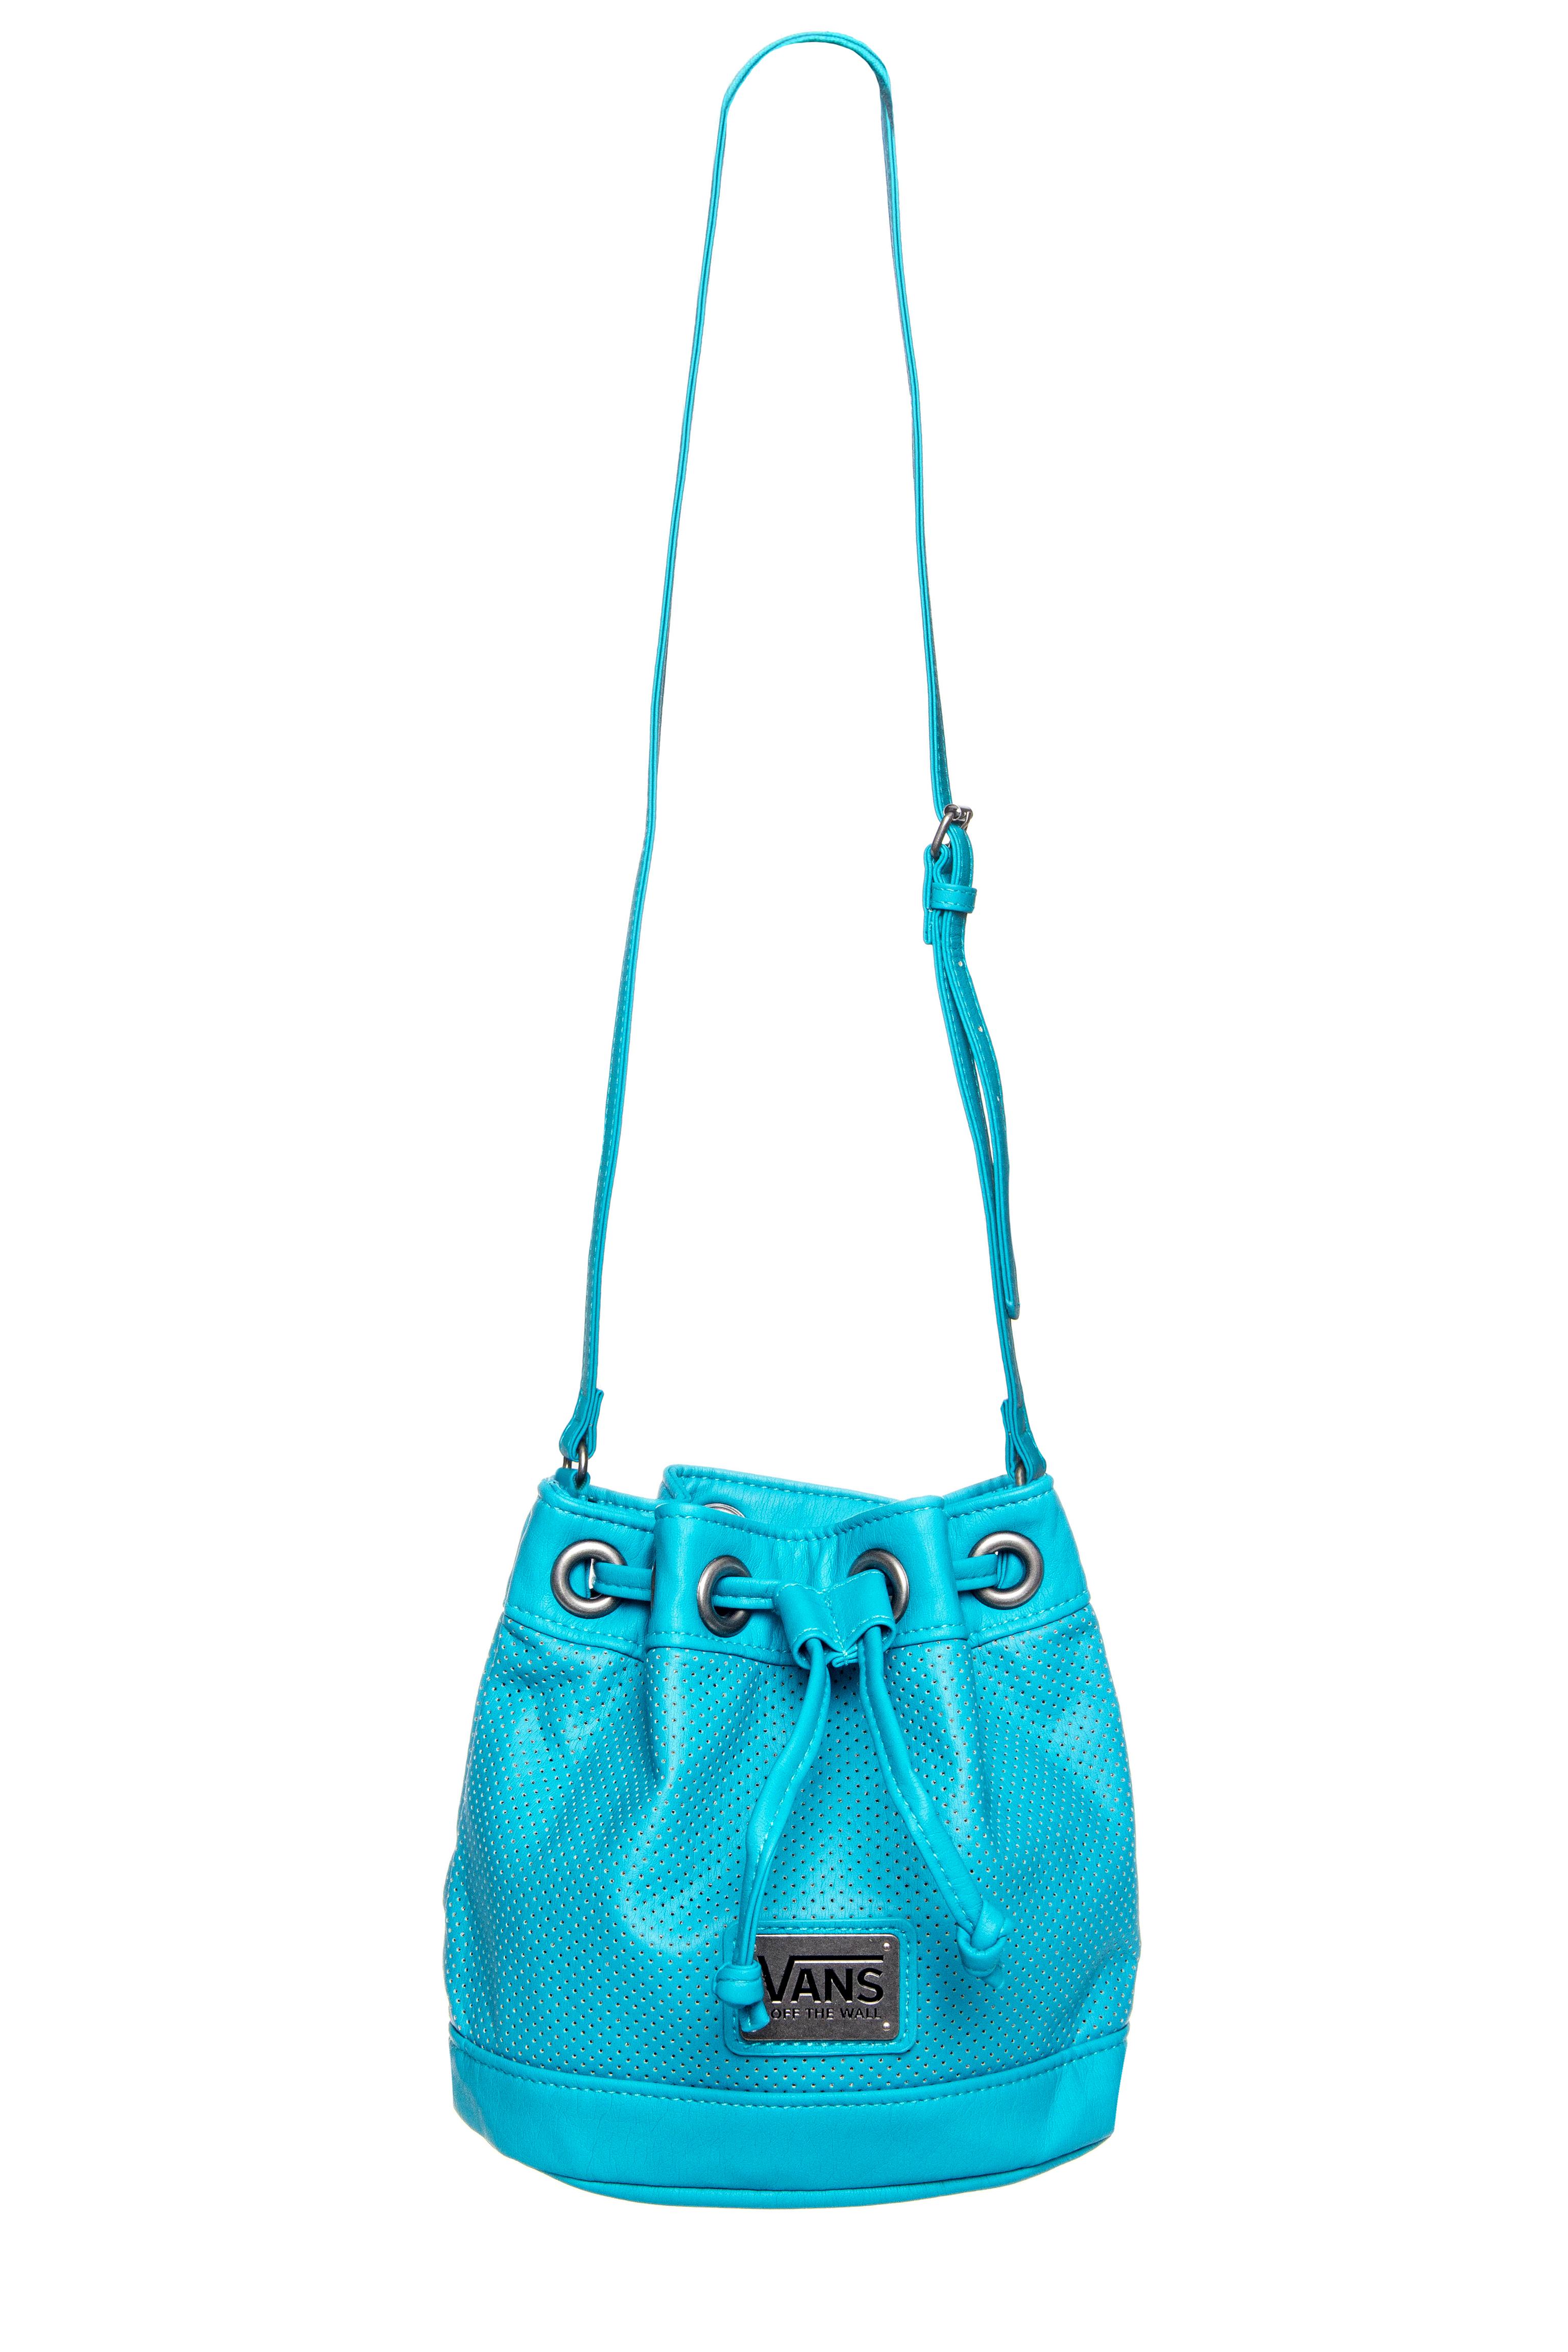 Griddy Mini Bucket Bag - Capri Breeze